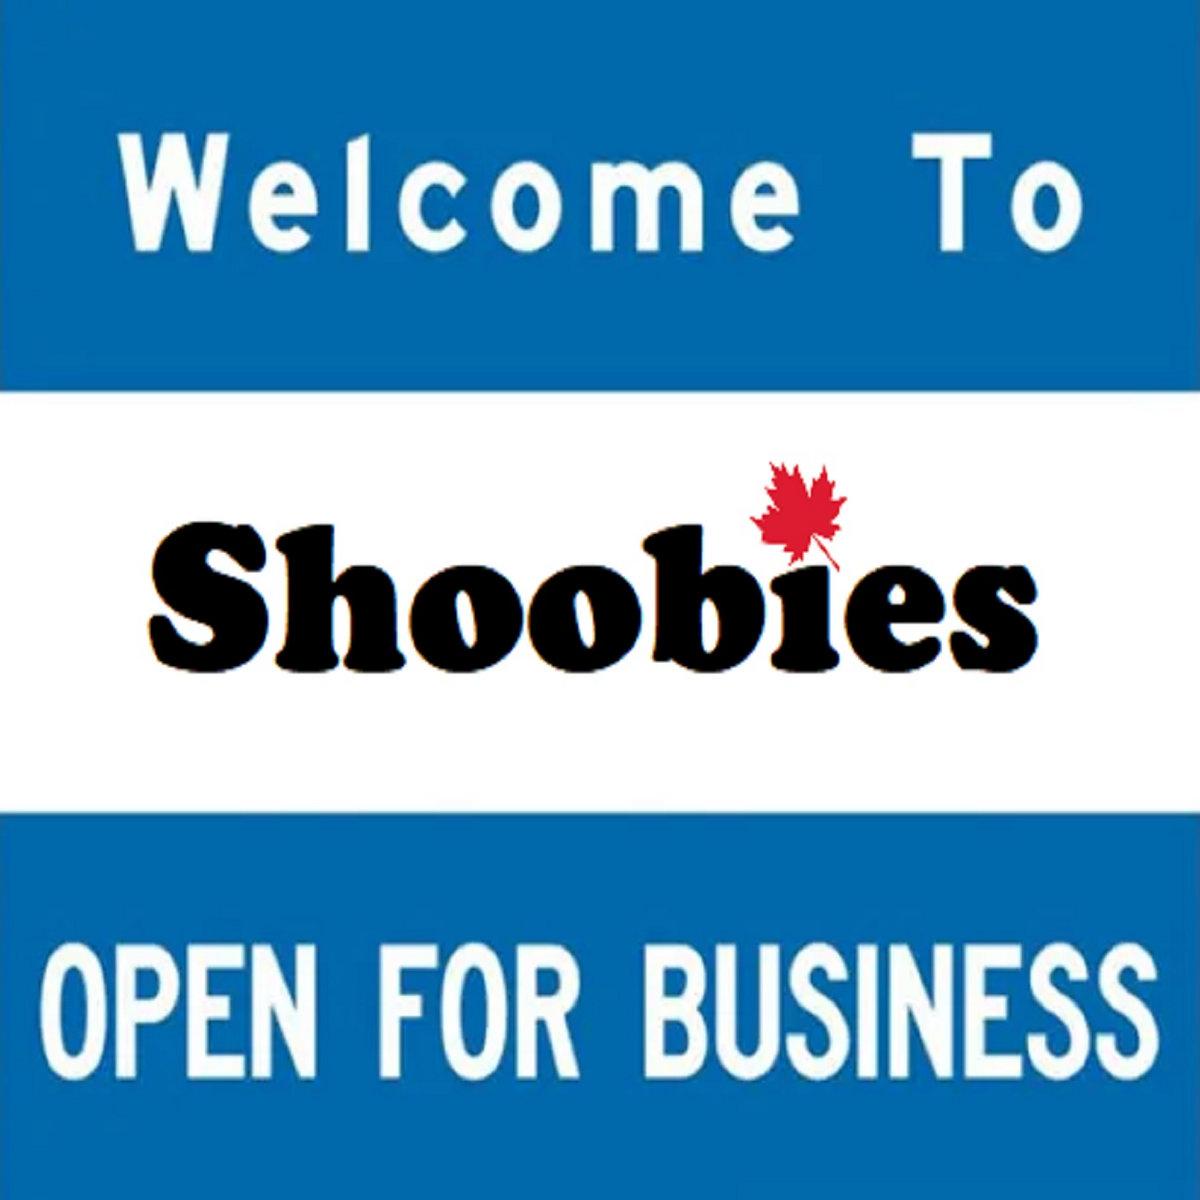 Image result for shoobies open for business